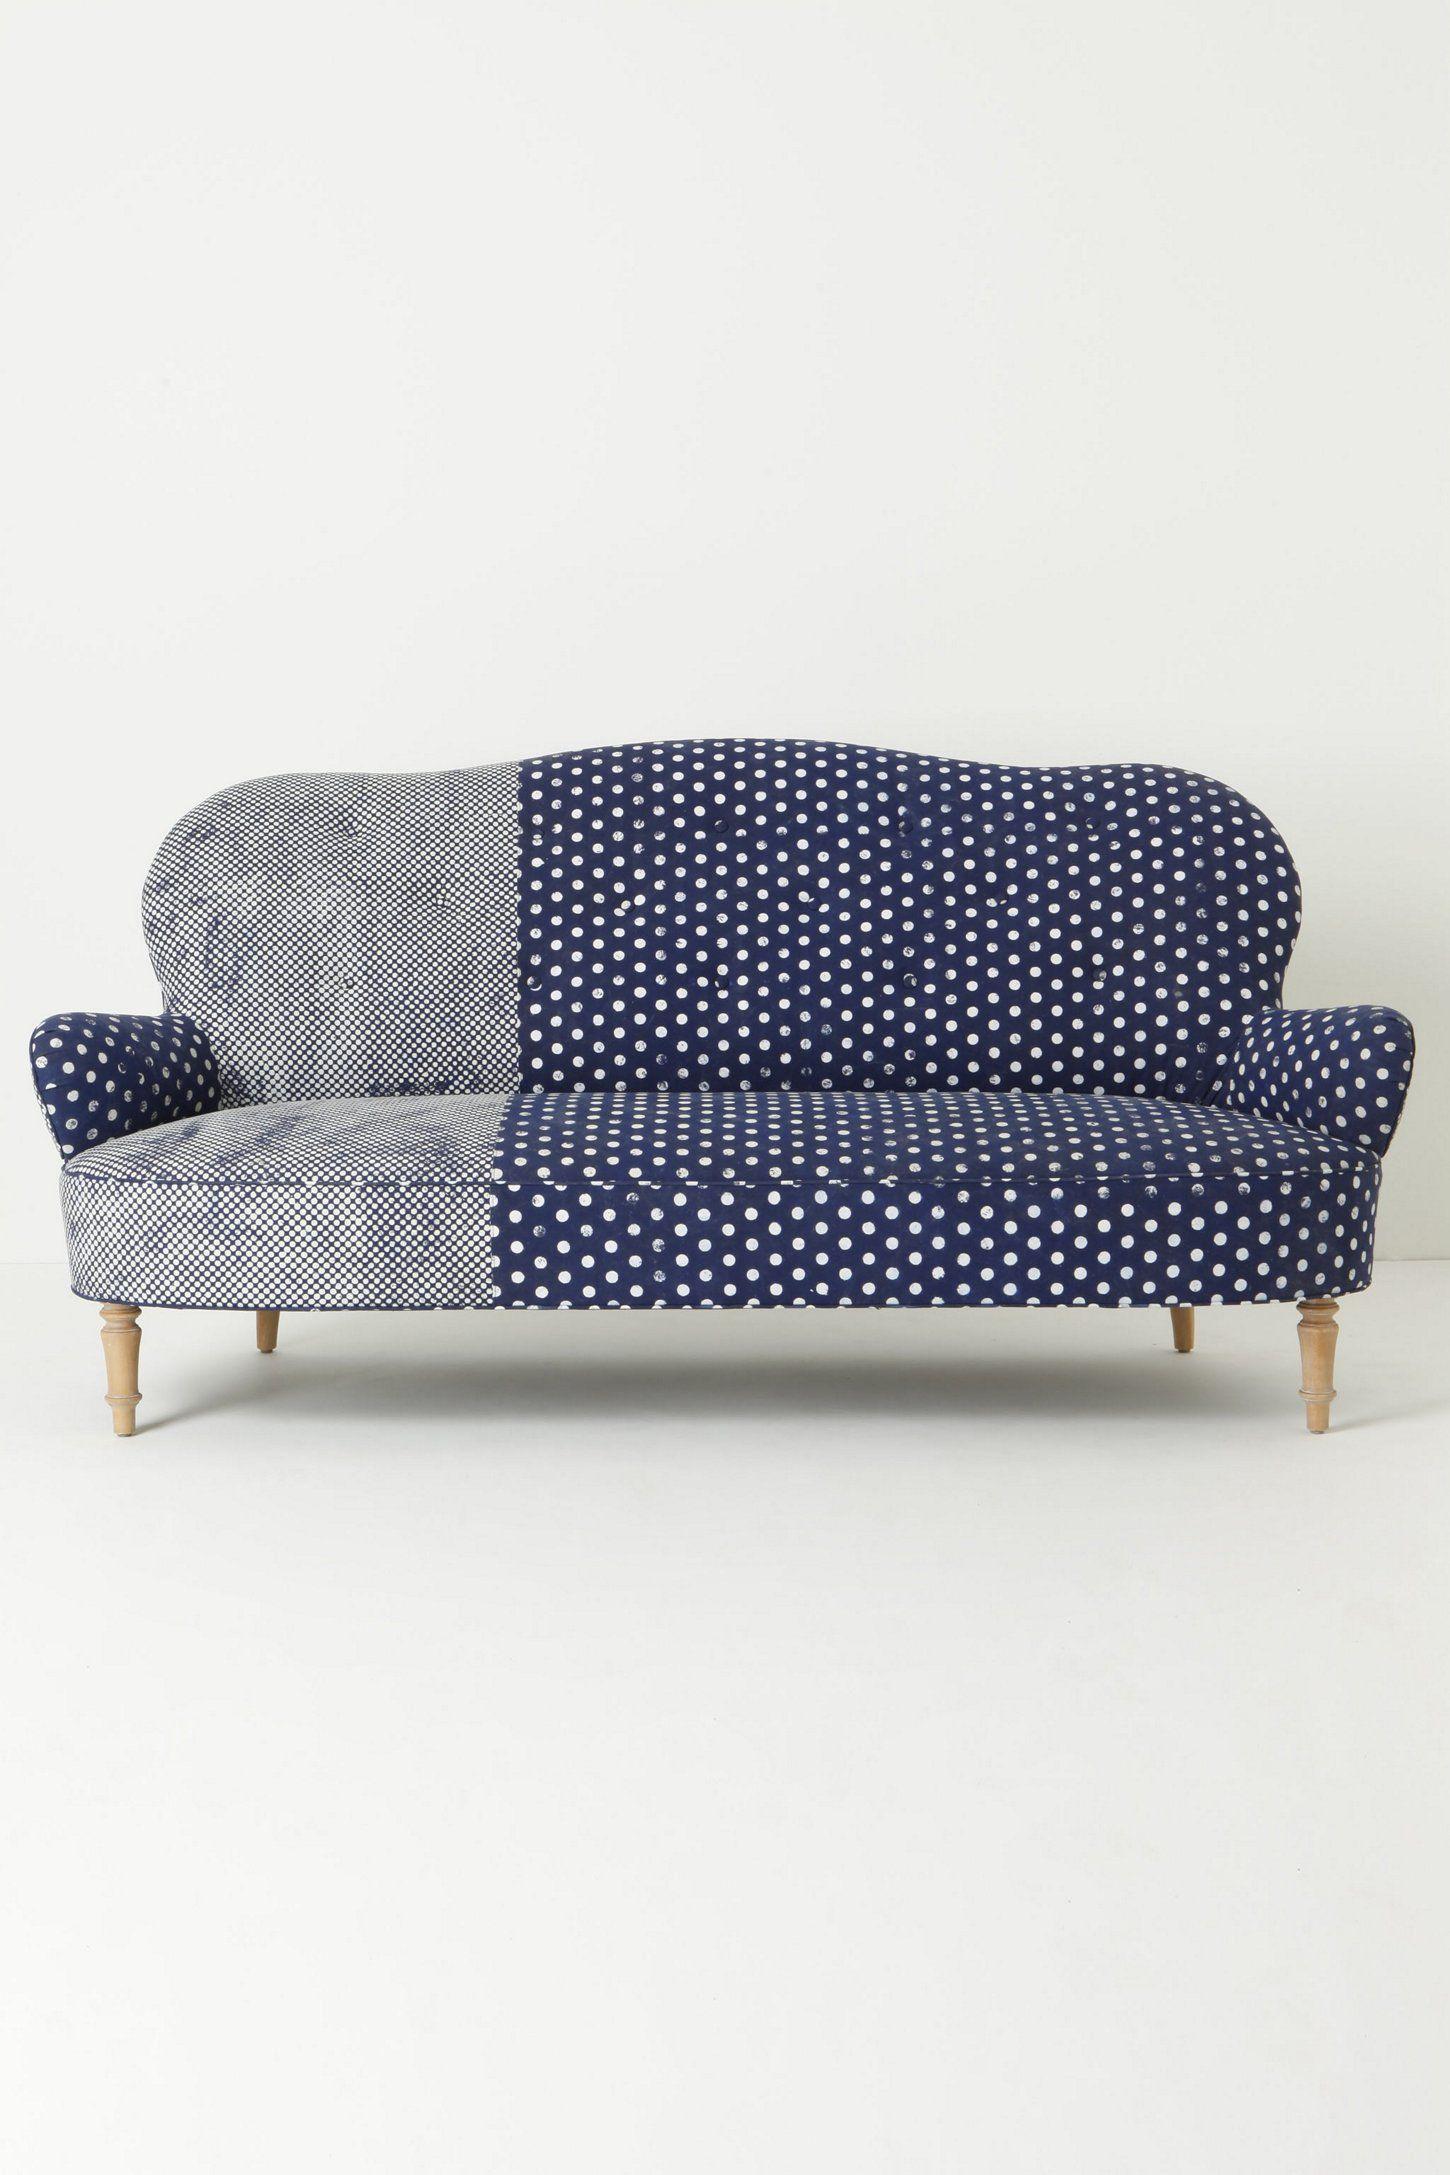 amazing spotty sofa anthropologie